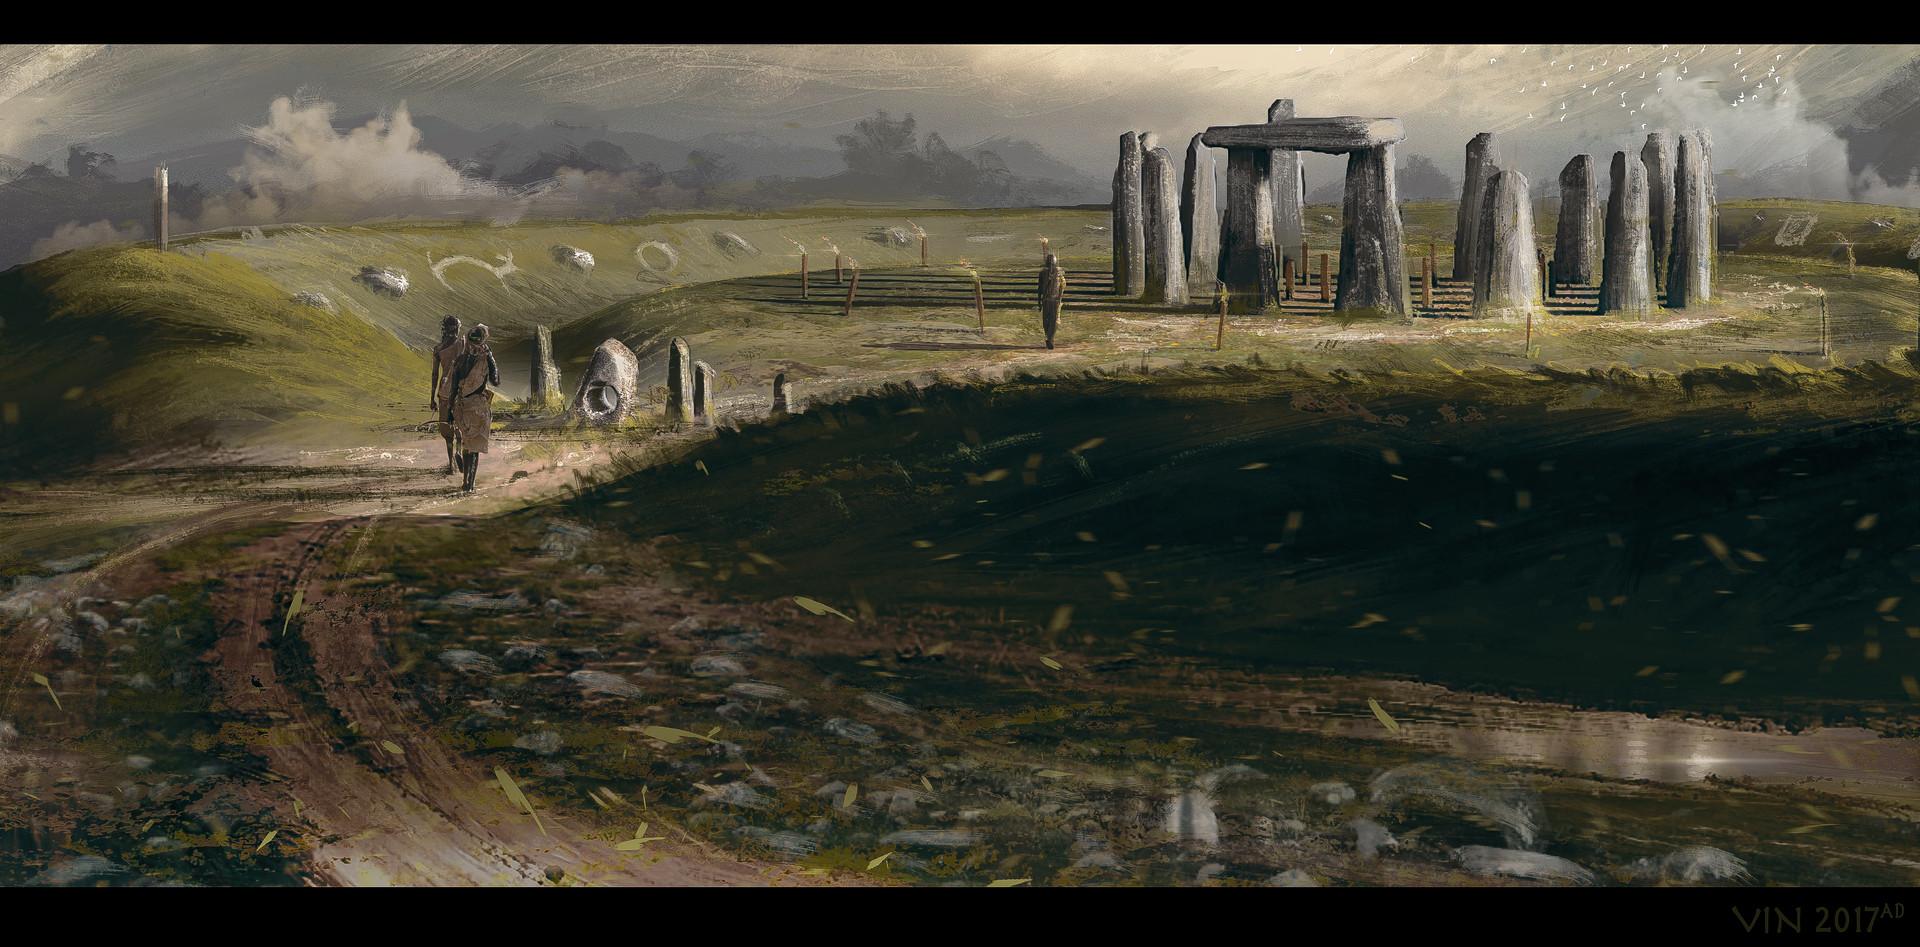 Vin hill neolithicmonumentfinal